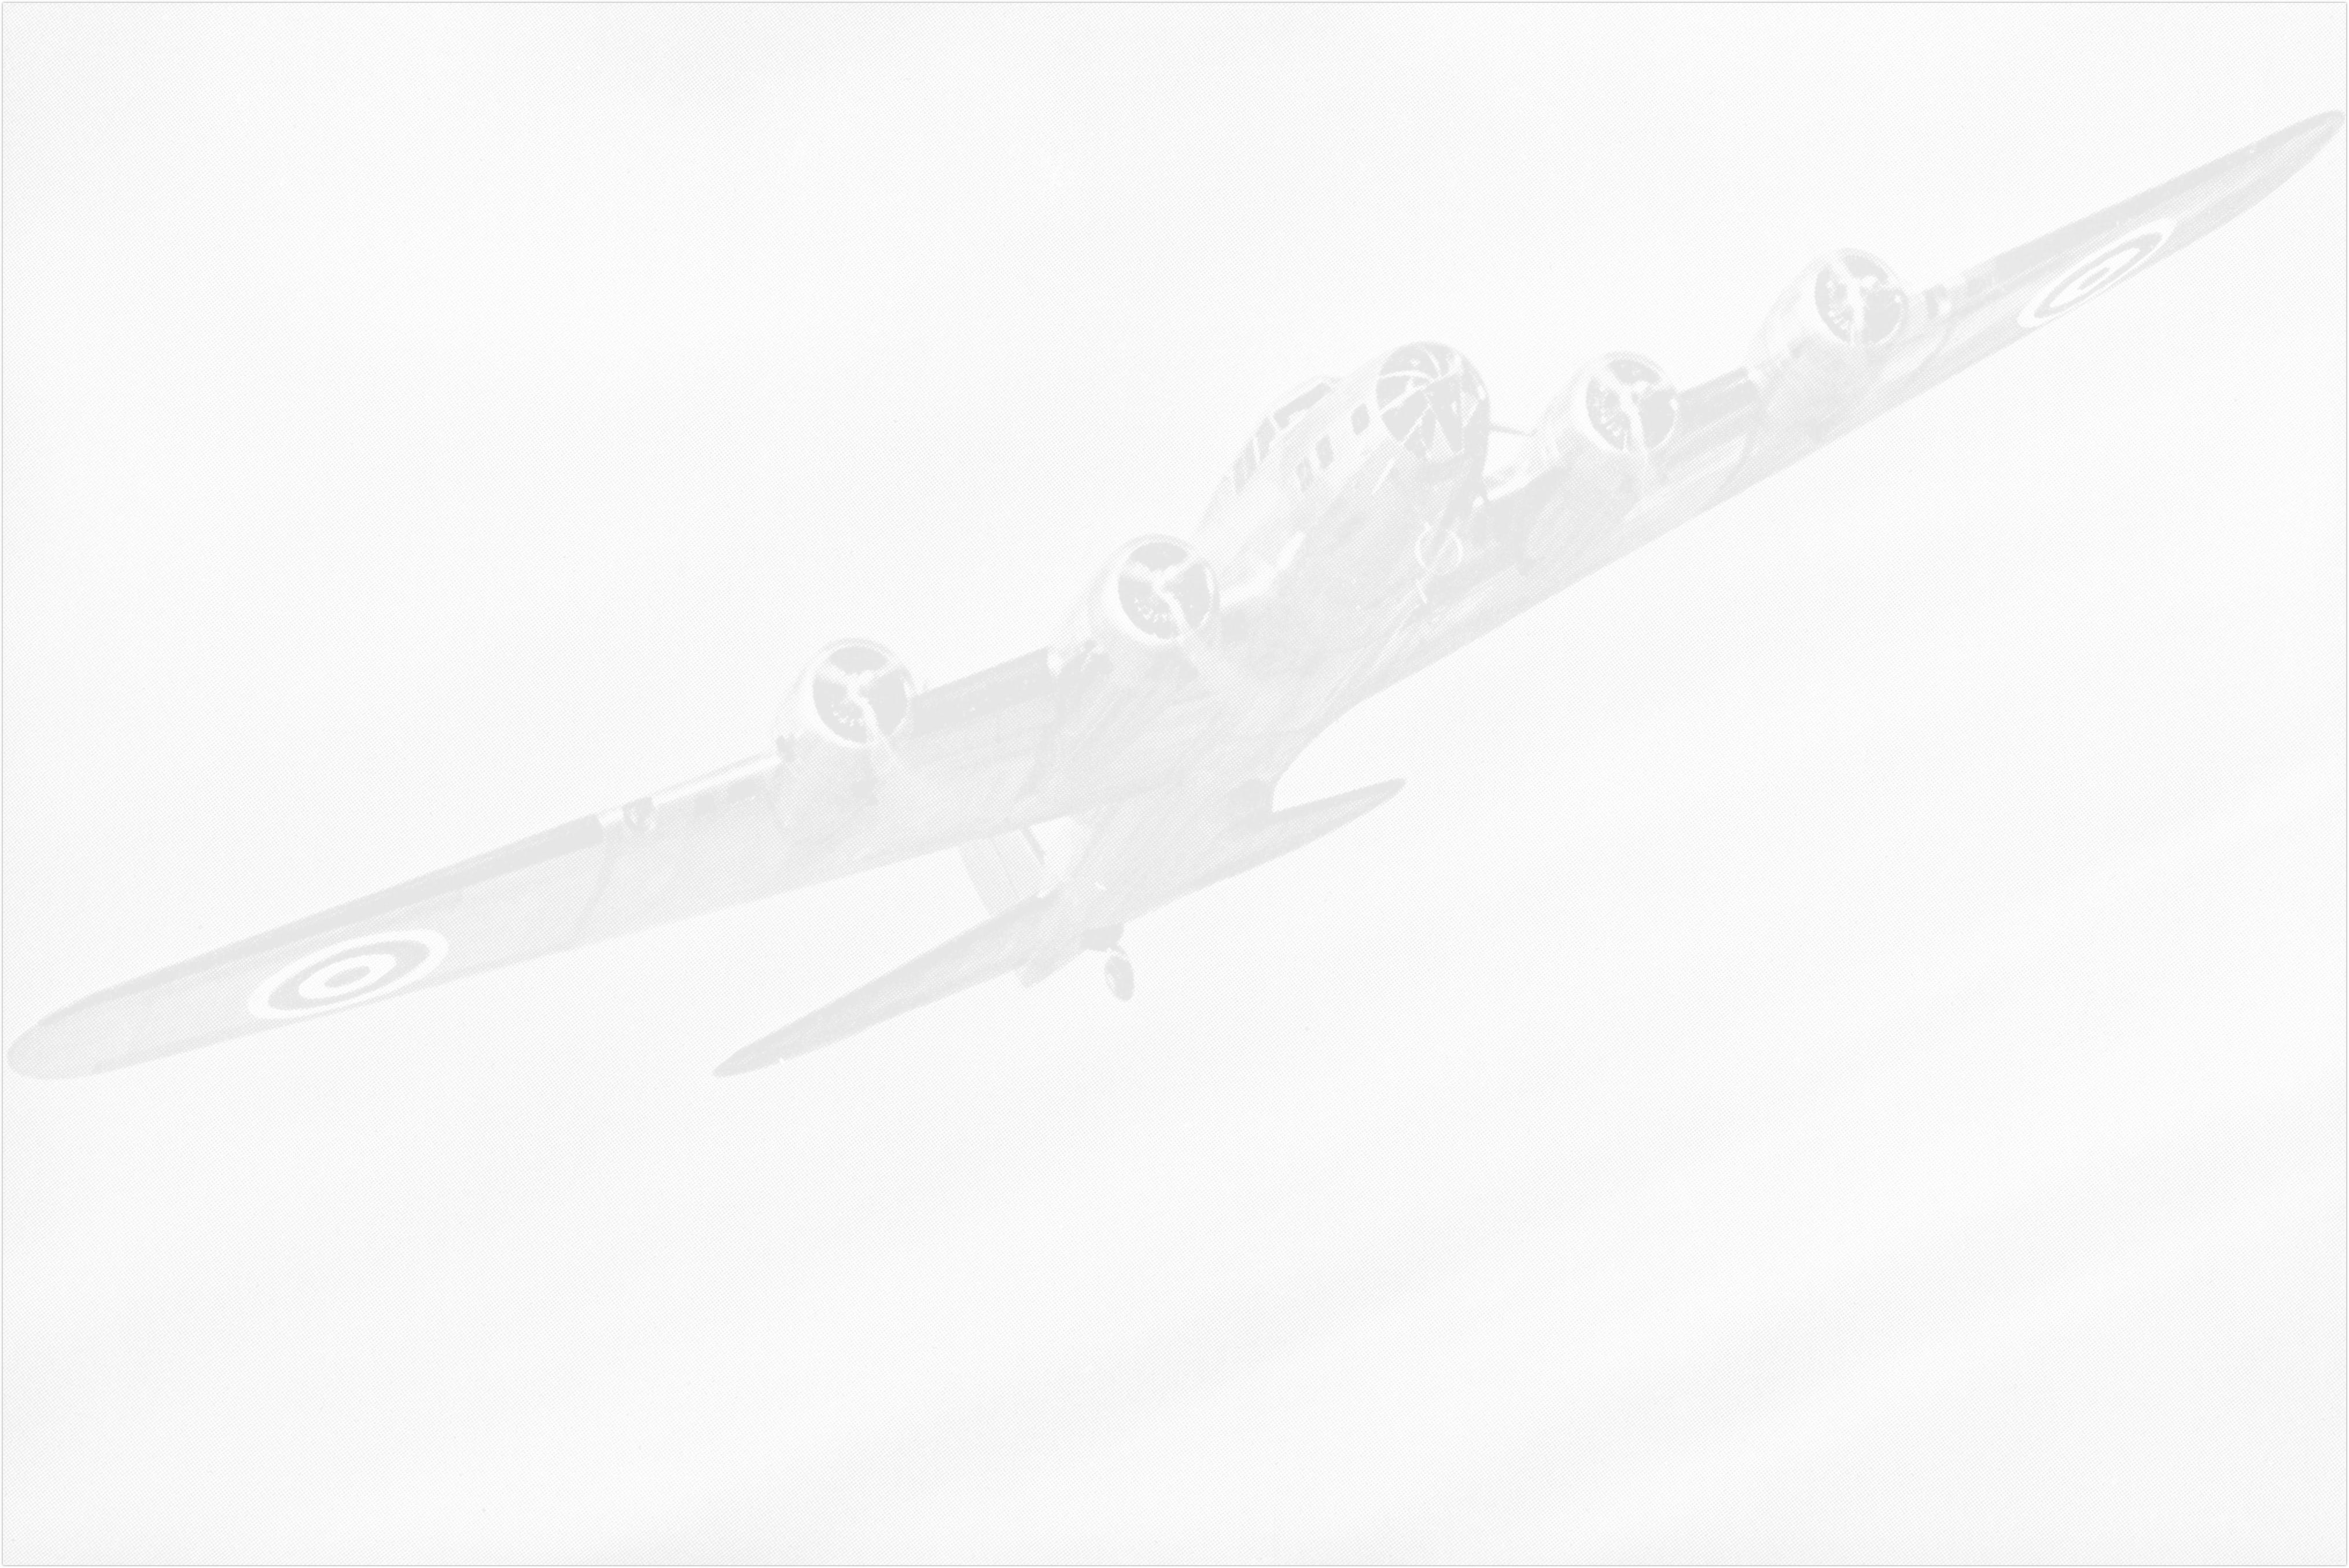 1941 Warplanes, Series 1, V156-2, St. Lawrence Starch